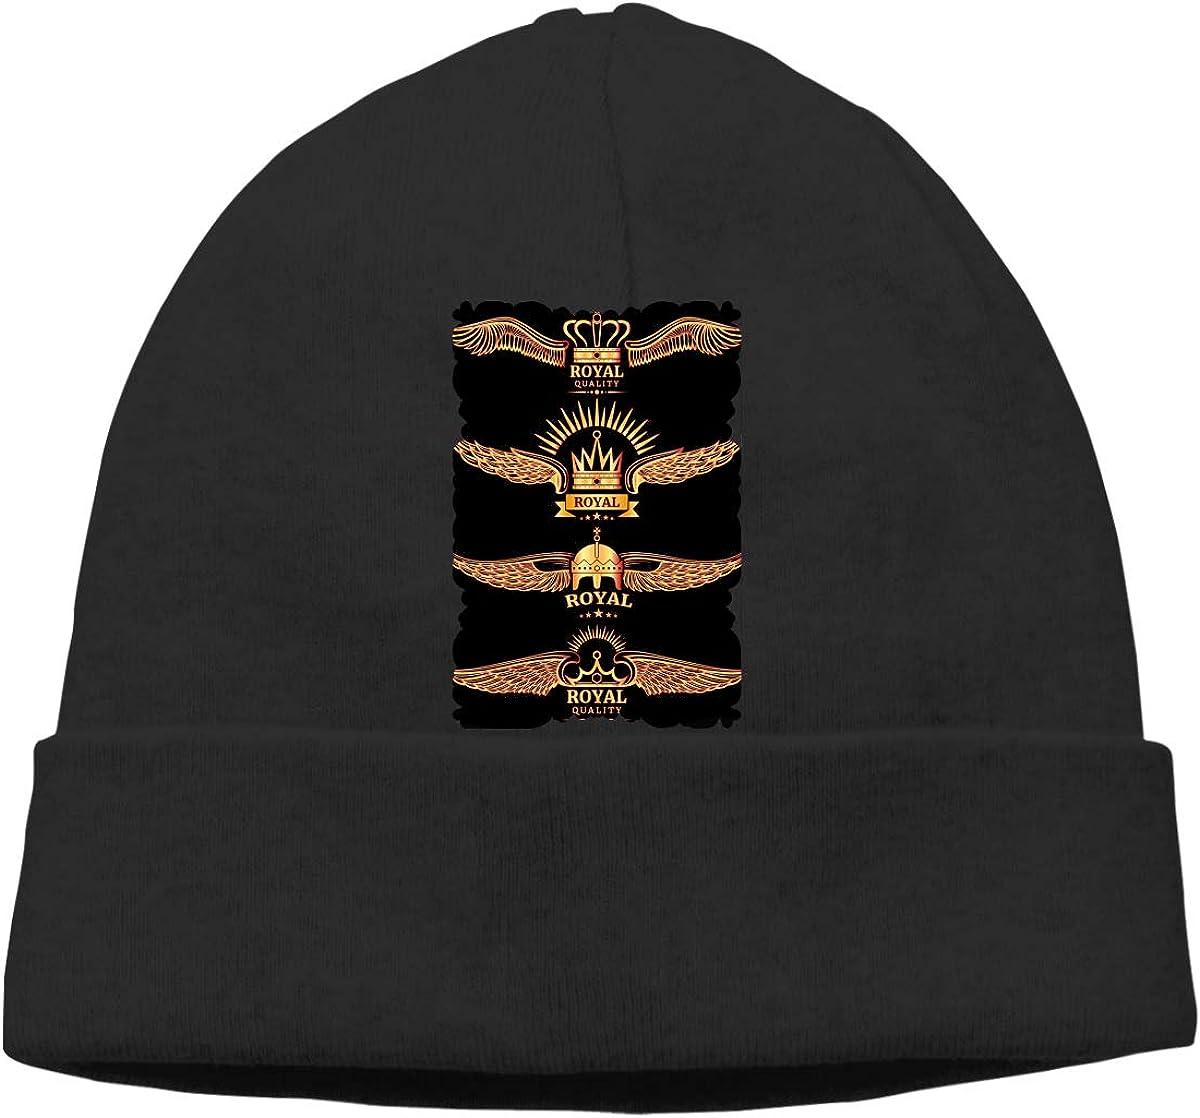 Sppeuio Crown Royal Cap Stylish